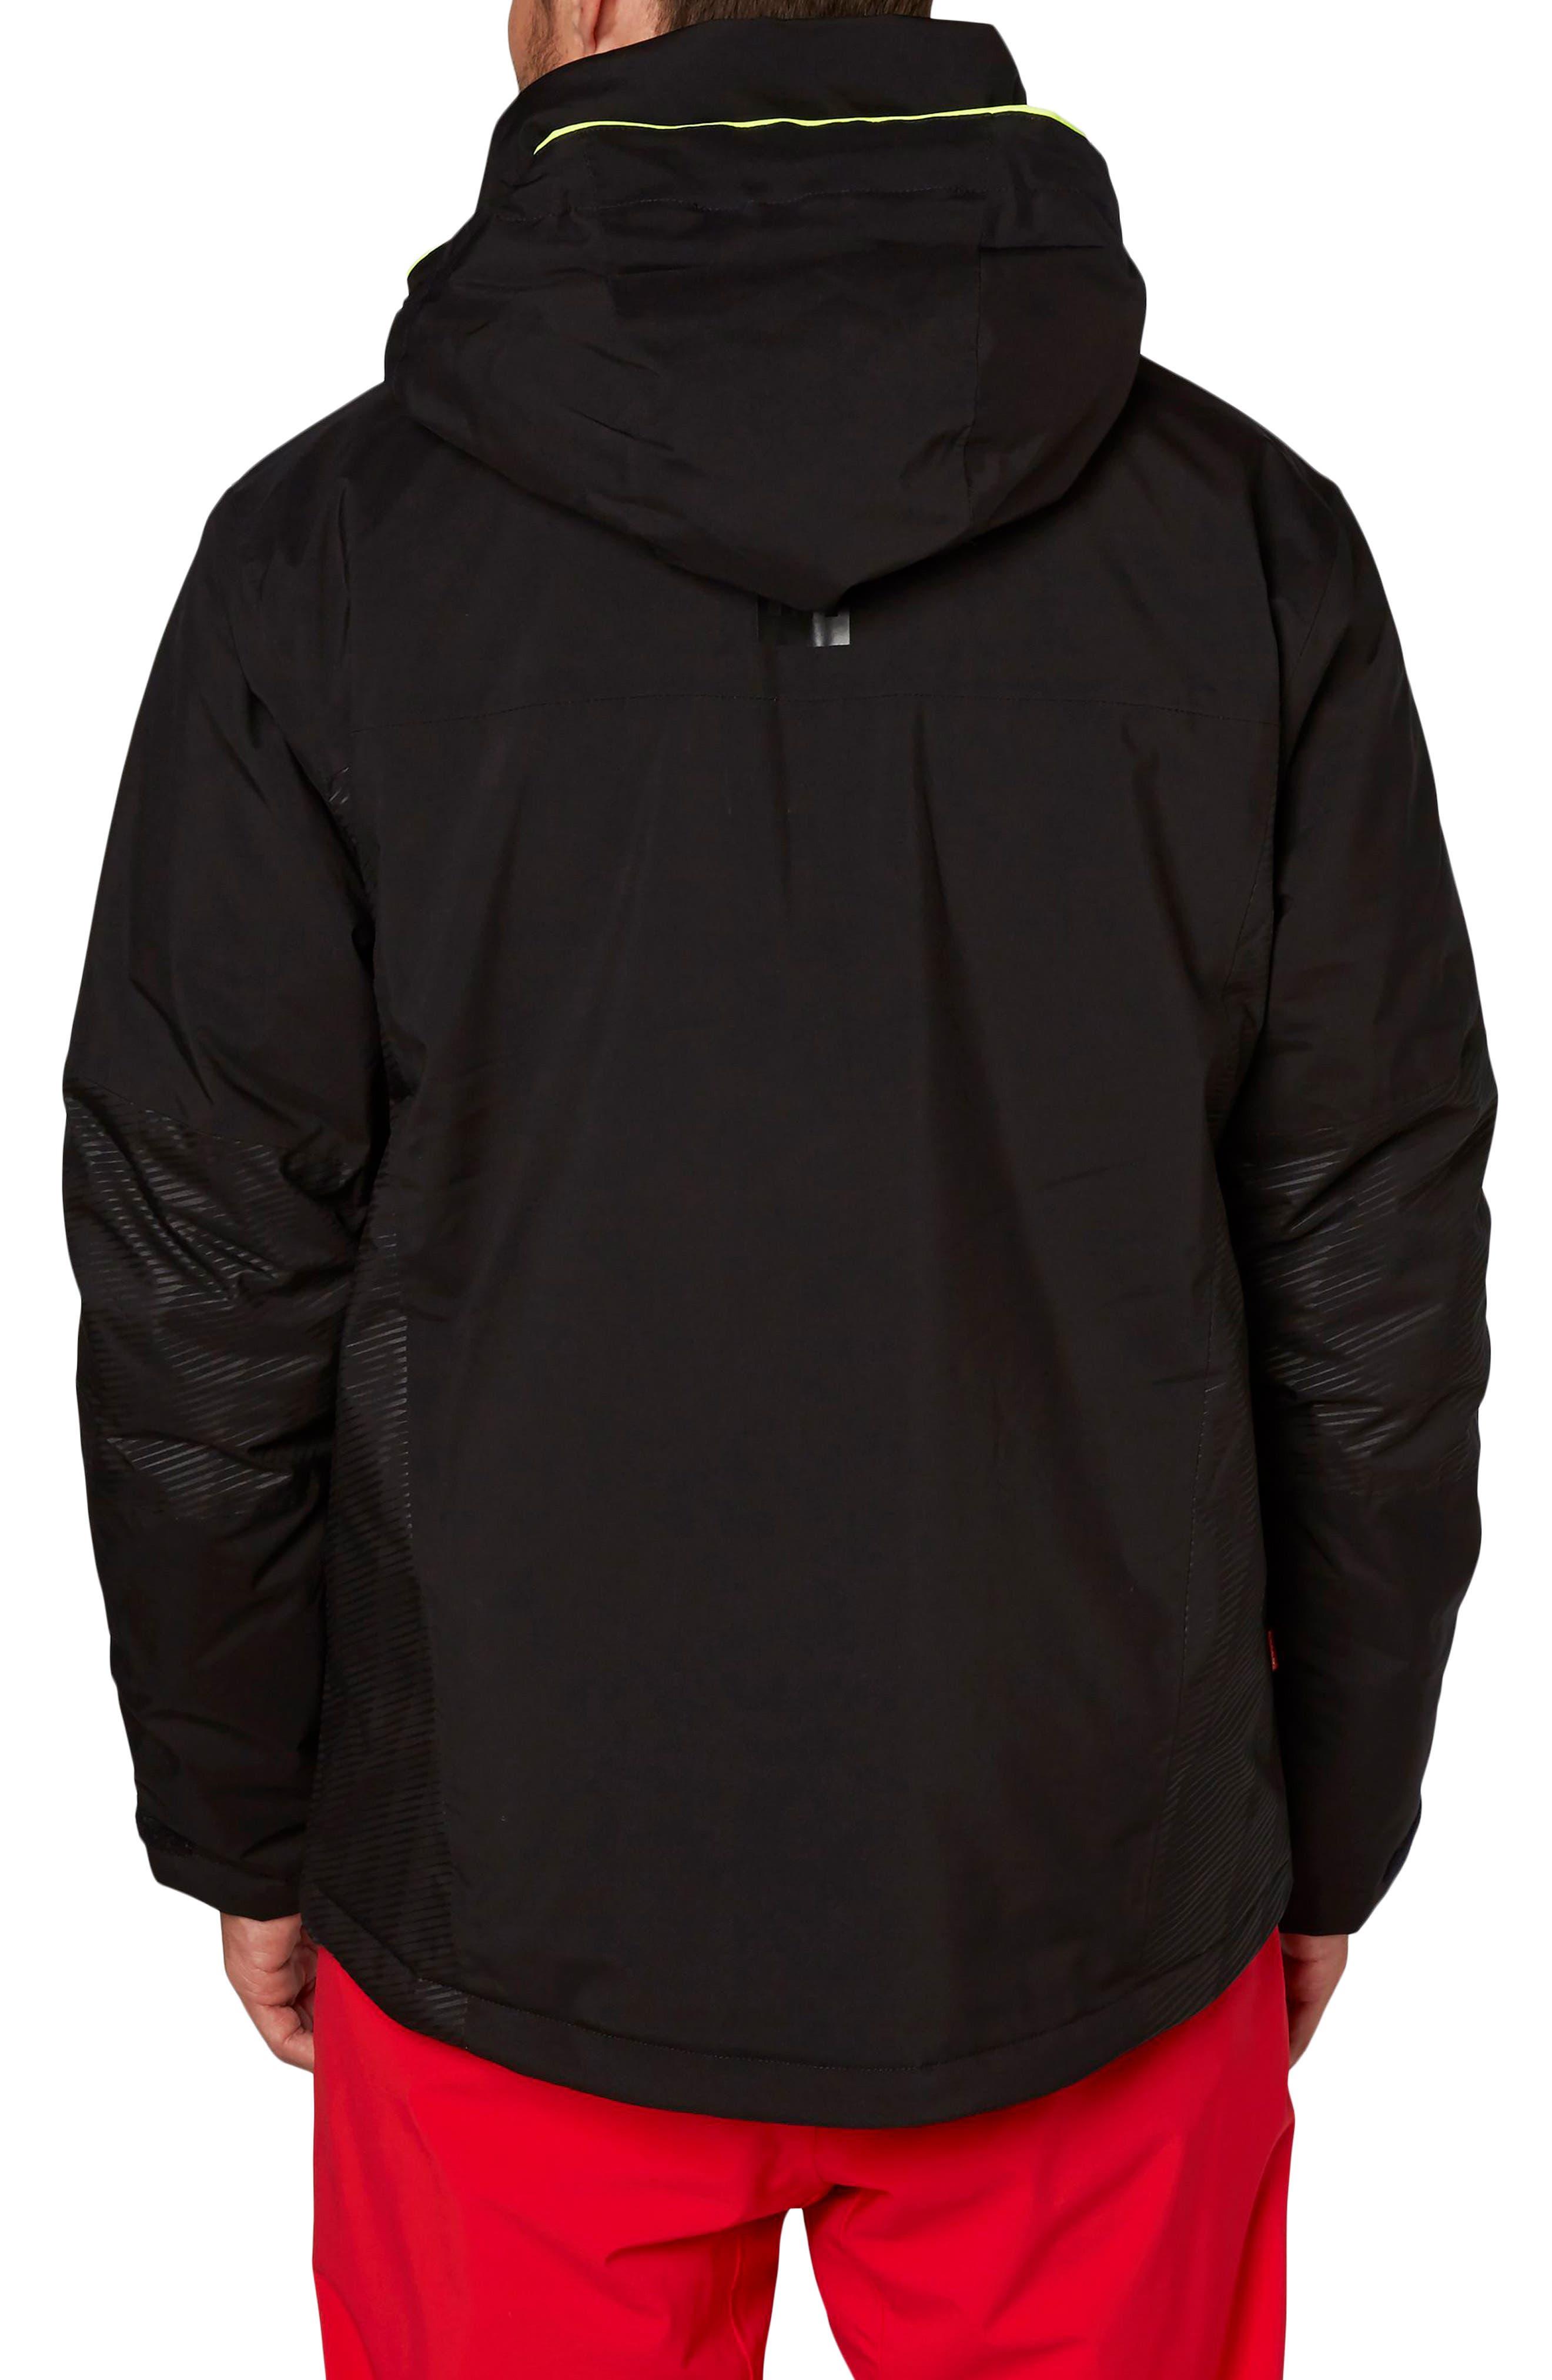 Double Diamond Waterproof Jacket,                             Alternate thumbnail 2, color,                             001